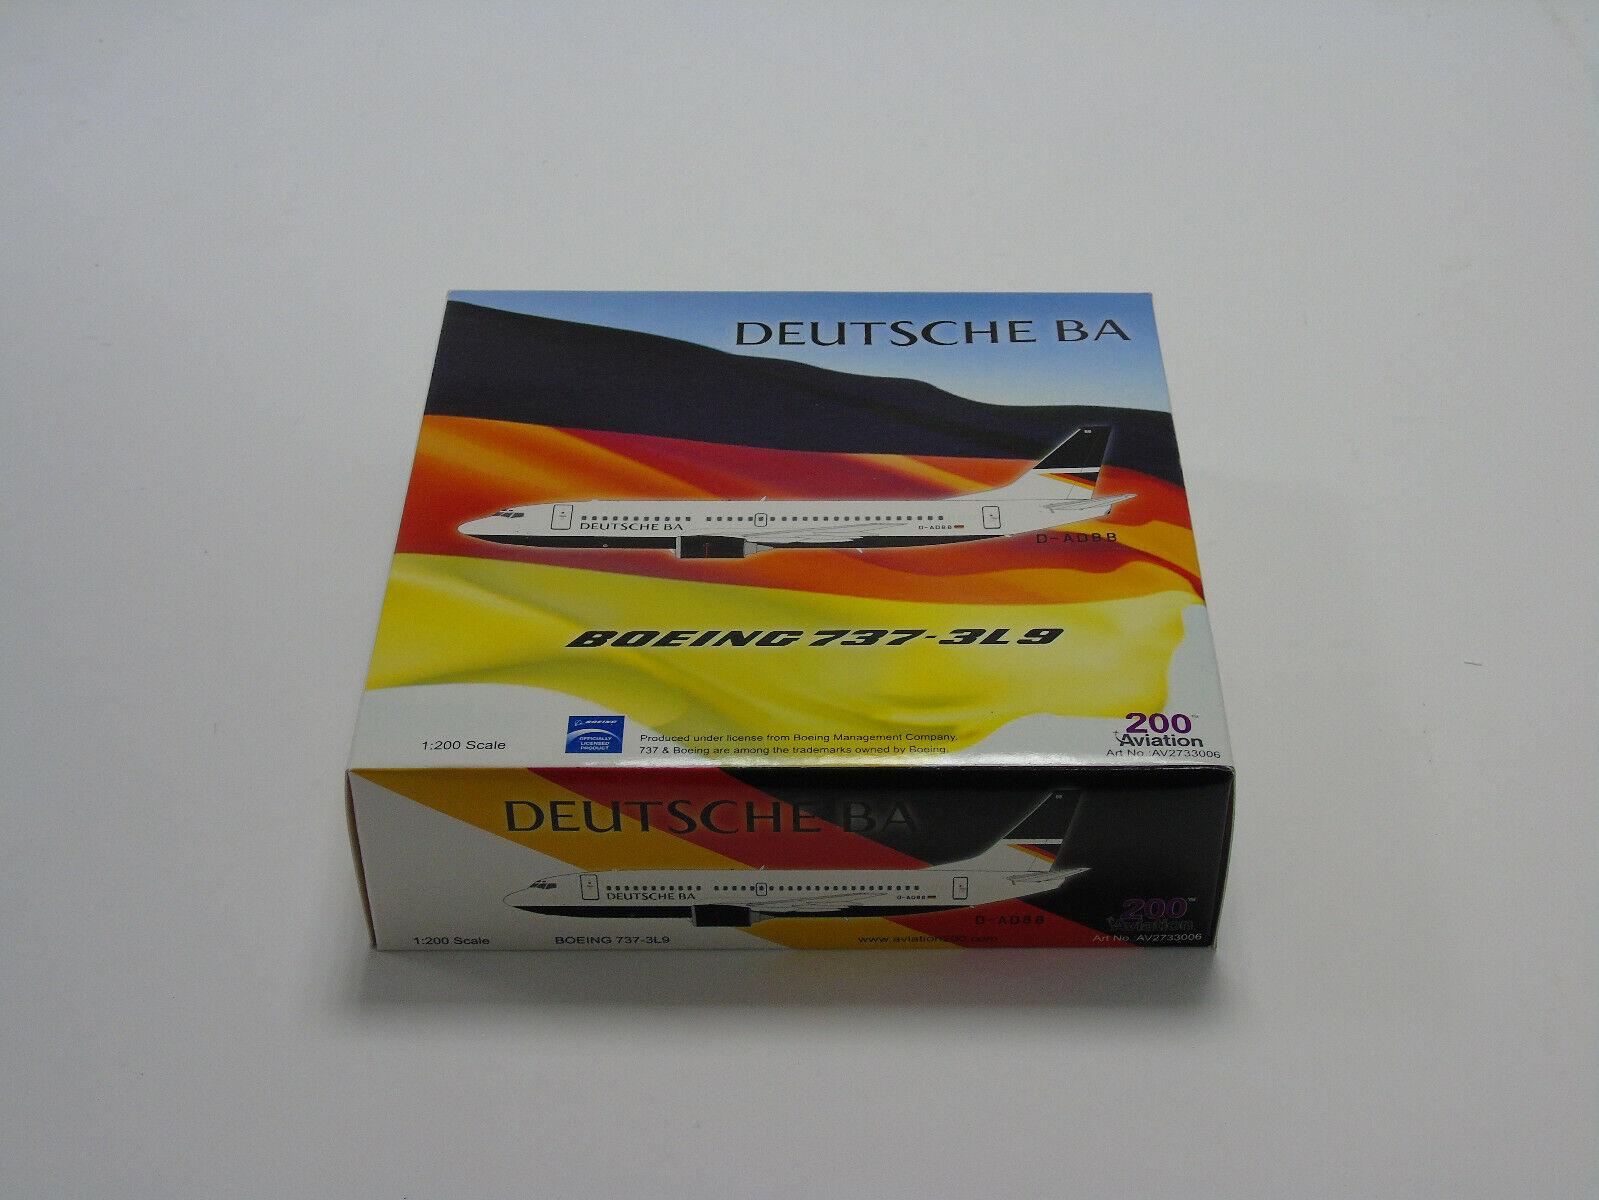 AV2733006 200 Aviation Boeing 737-3L9 Deutsche BA échelle 1 200 NEW & BOXED